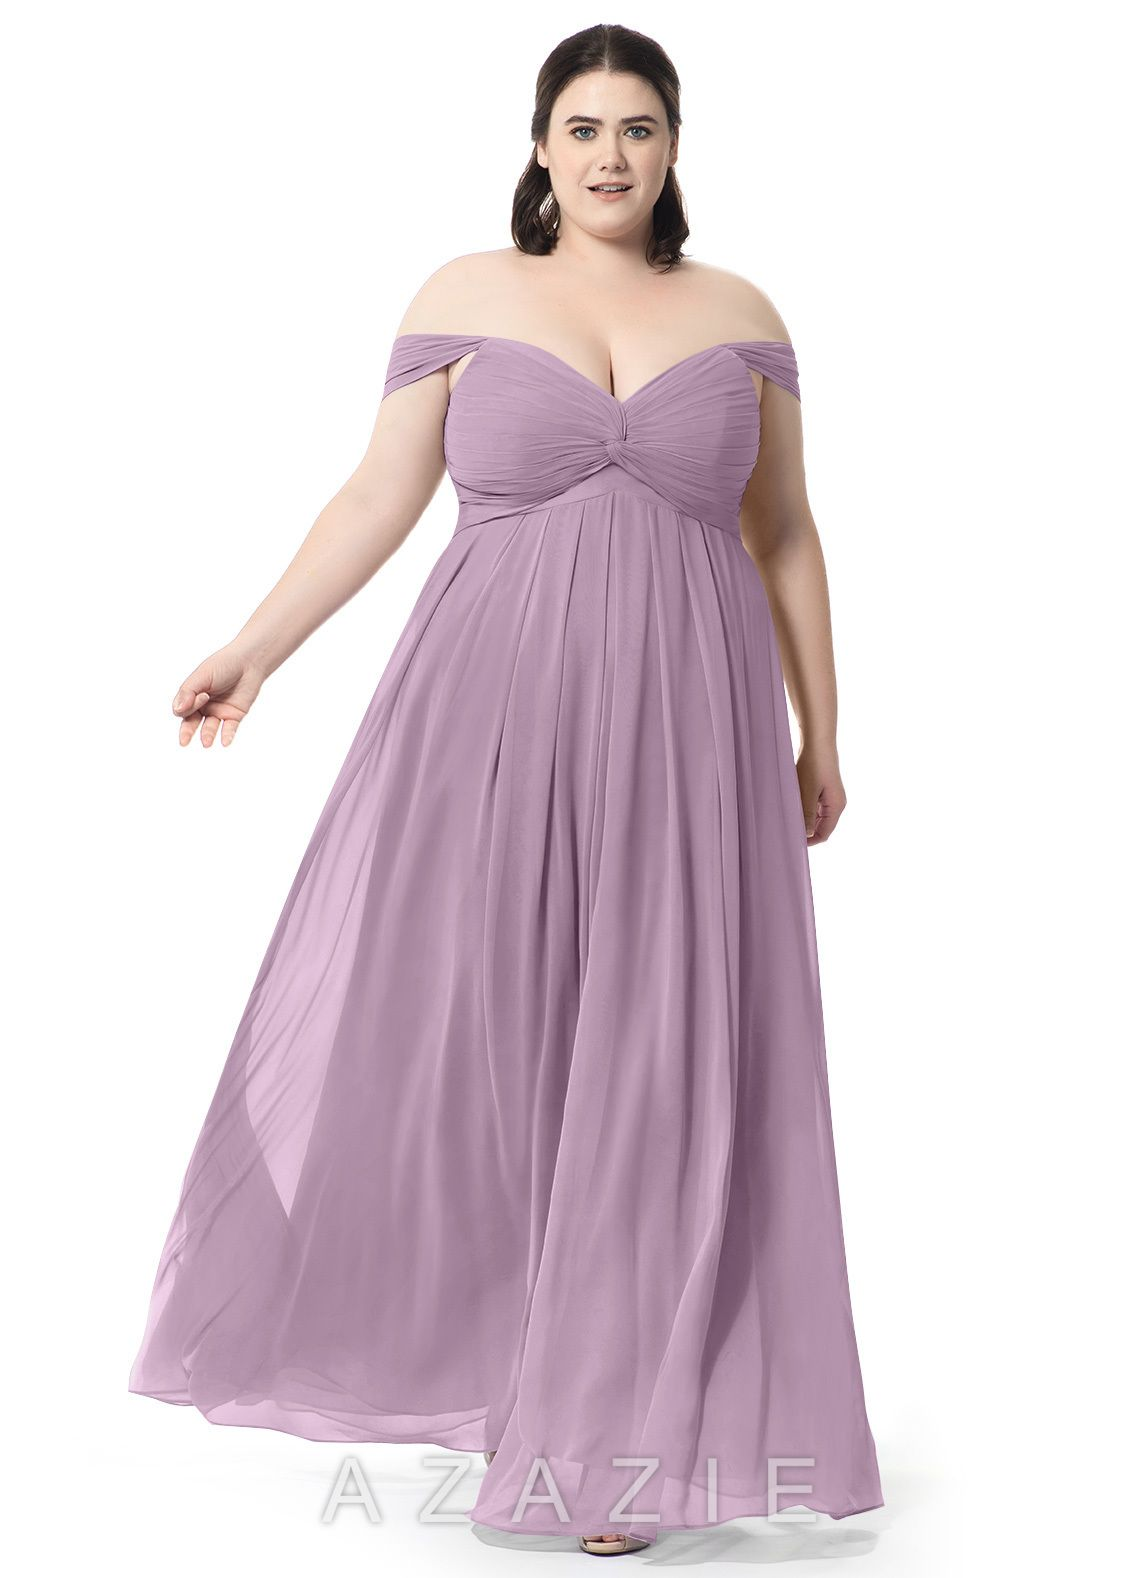 a8d82343dfd Azazie Kaitlynn Bridesmaid Dress - Wisteria